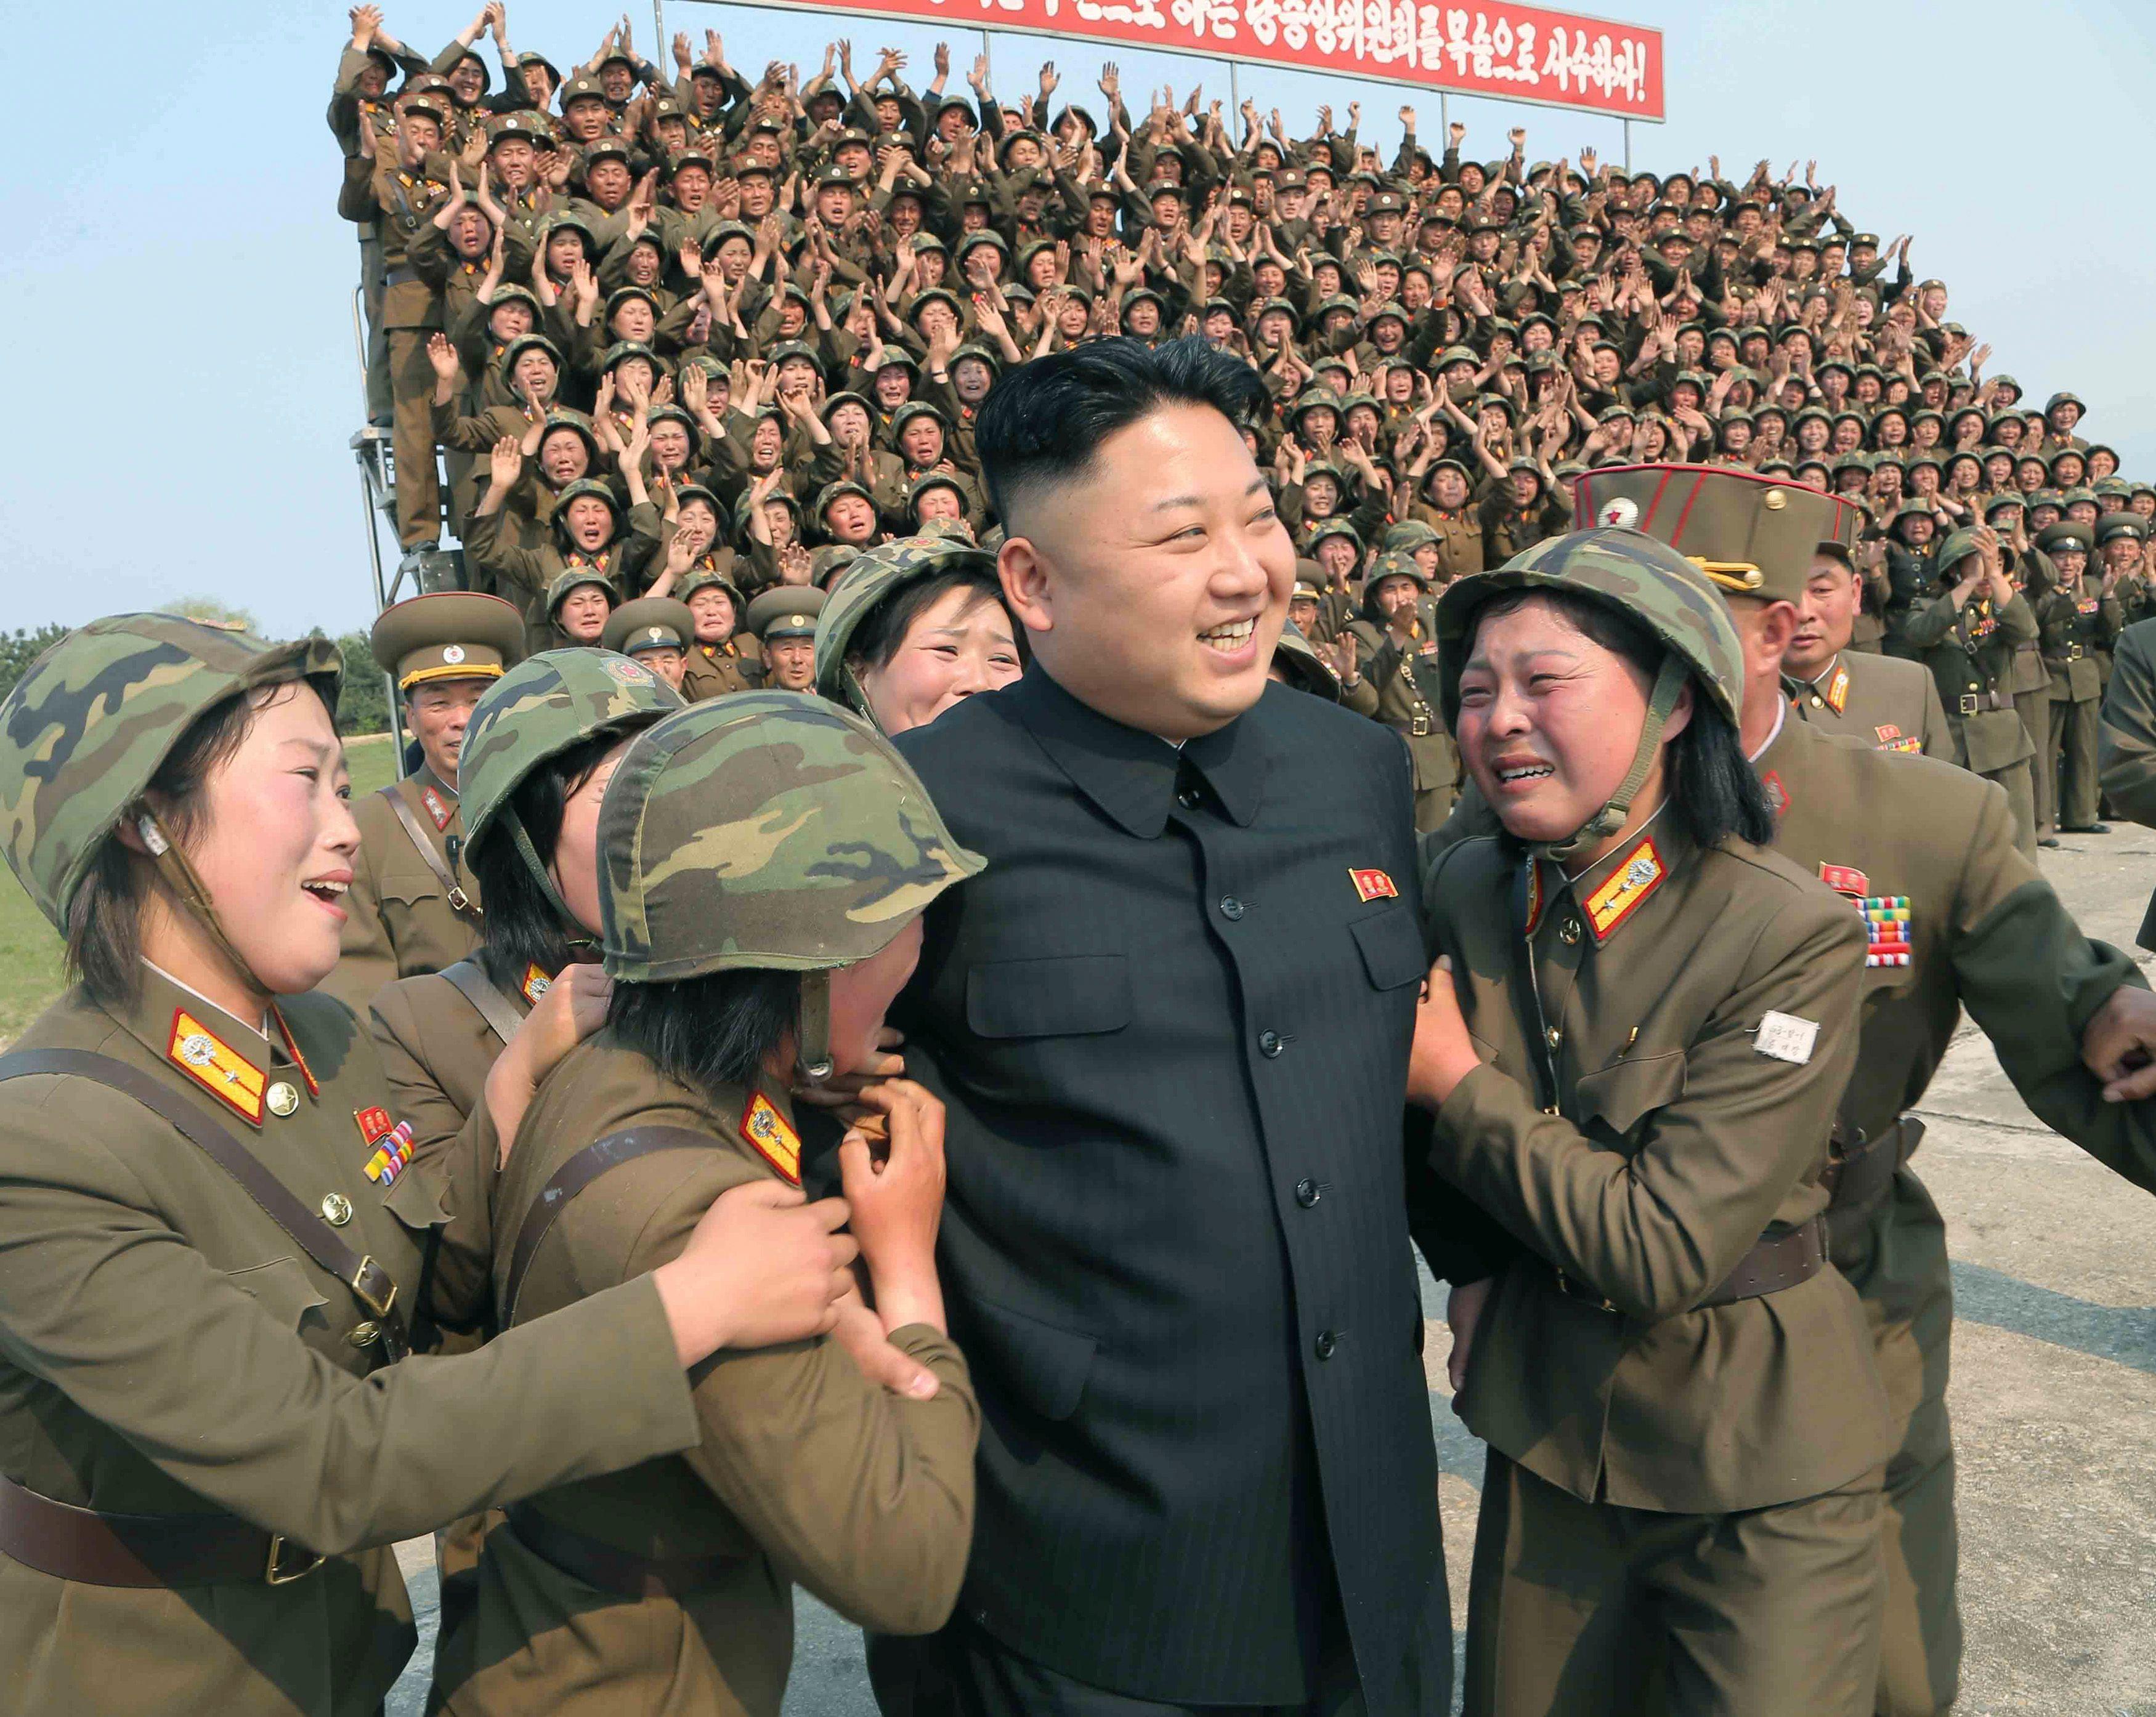 Le leader Kim Jong-Un